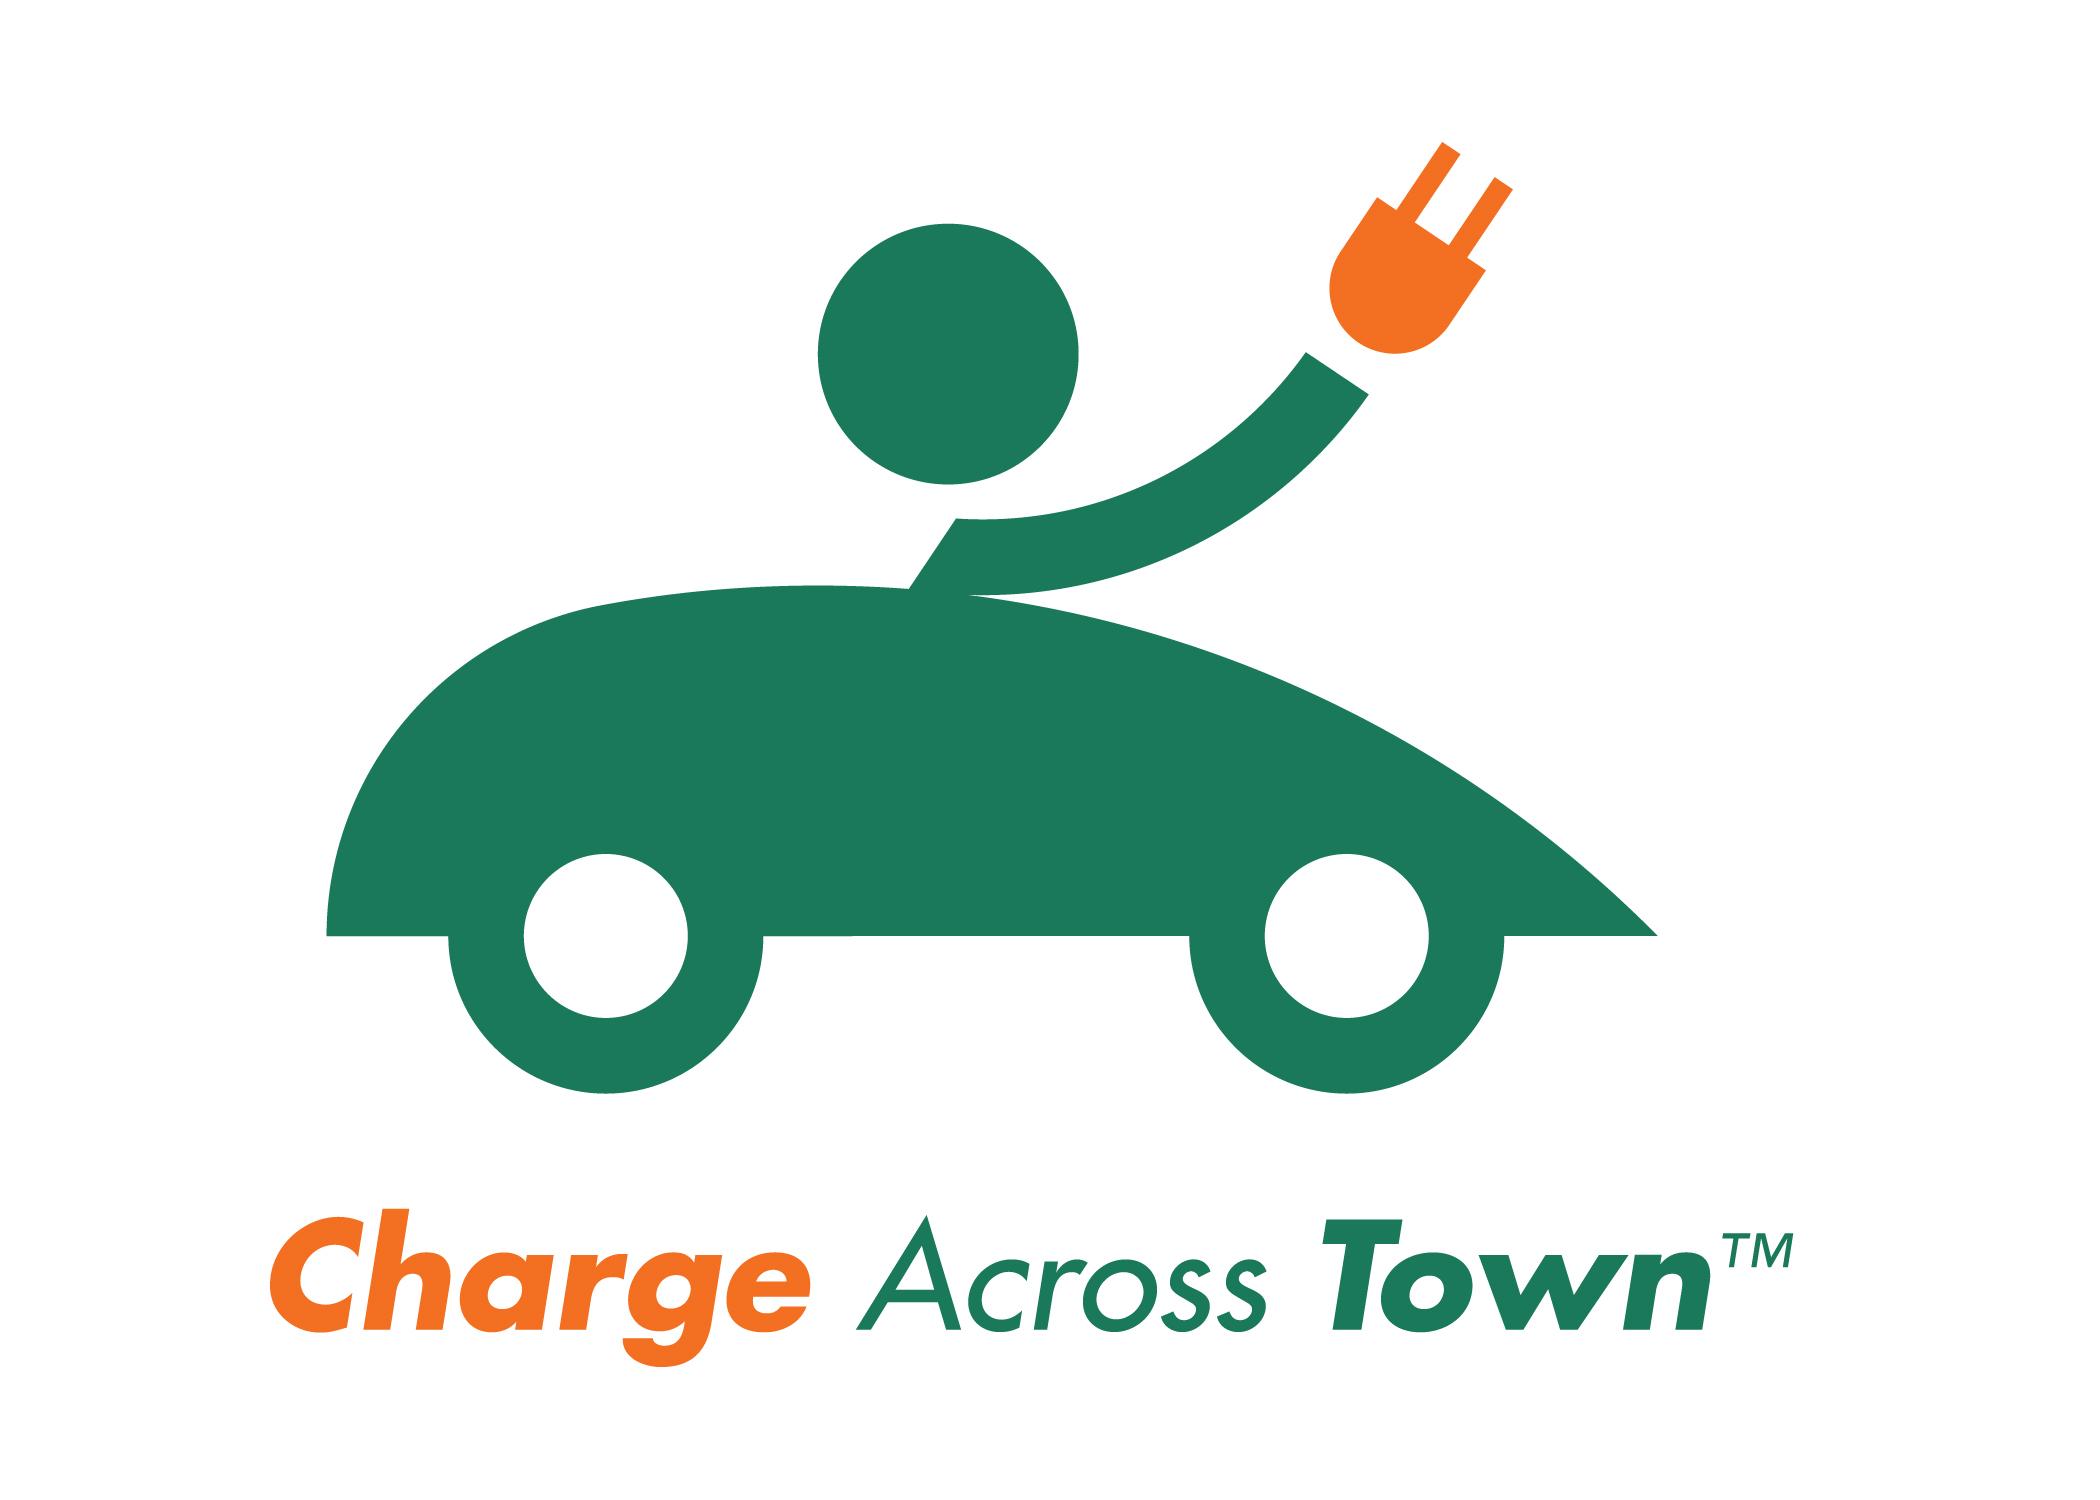 Charge Across Town_Final_logo (1).jpg